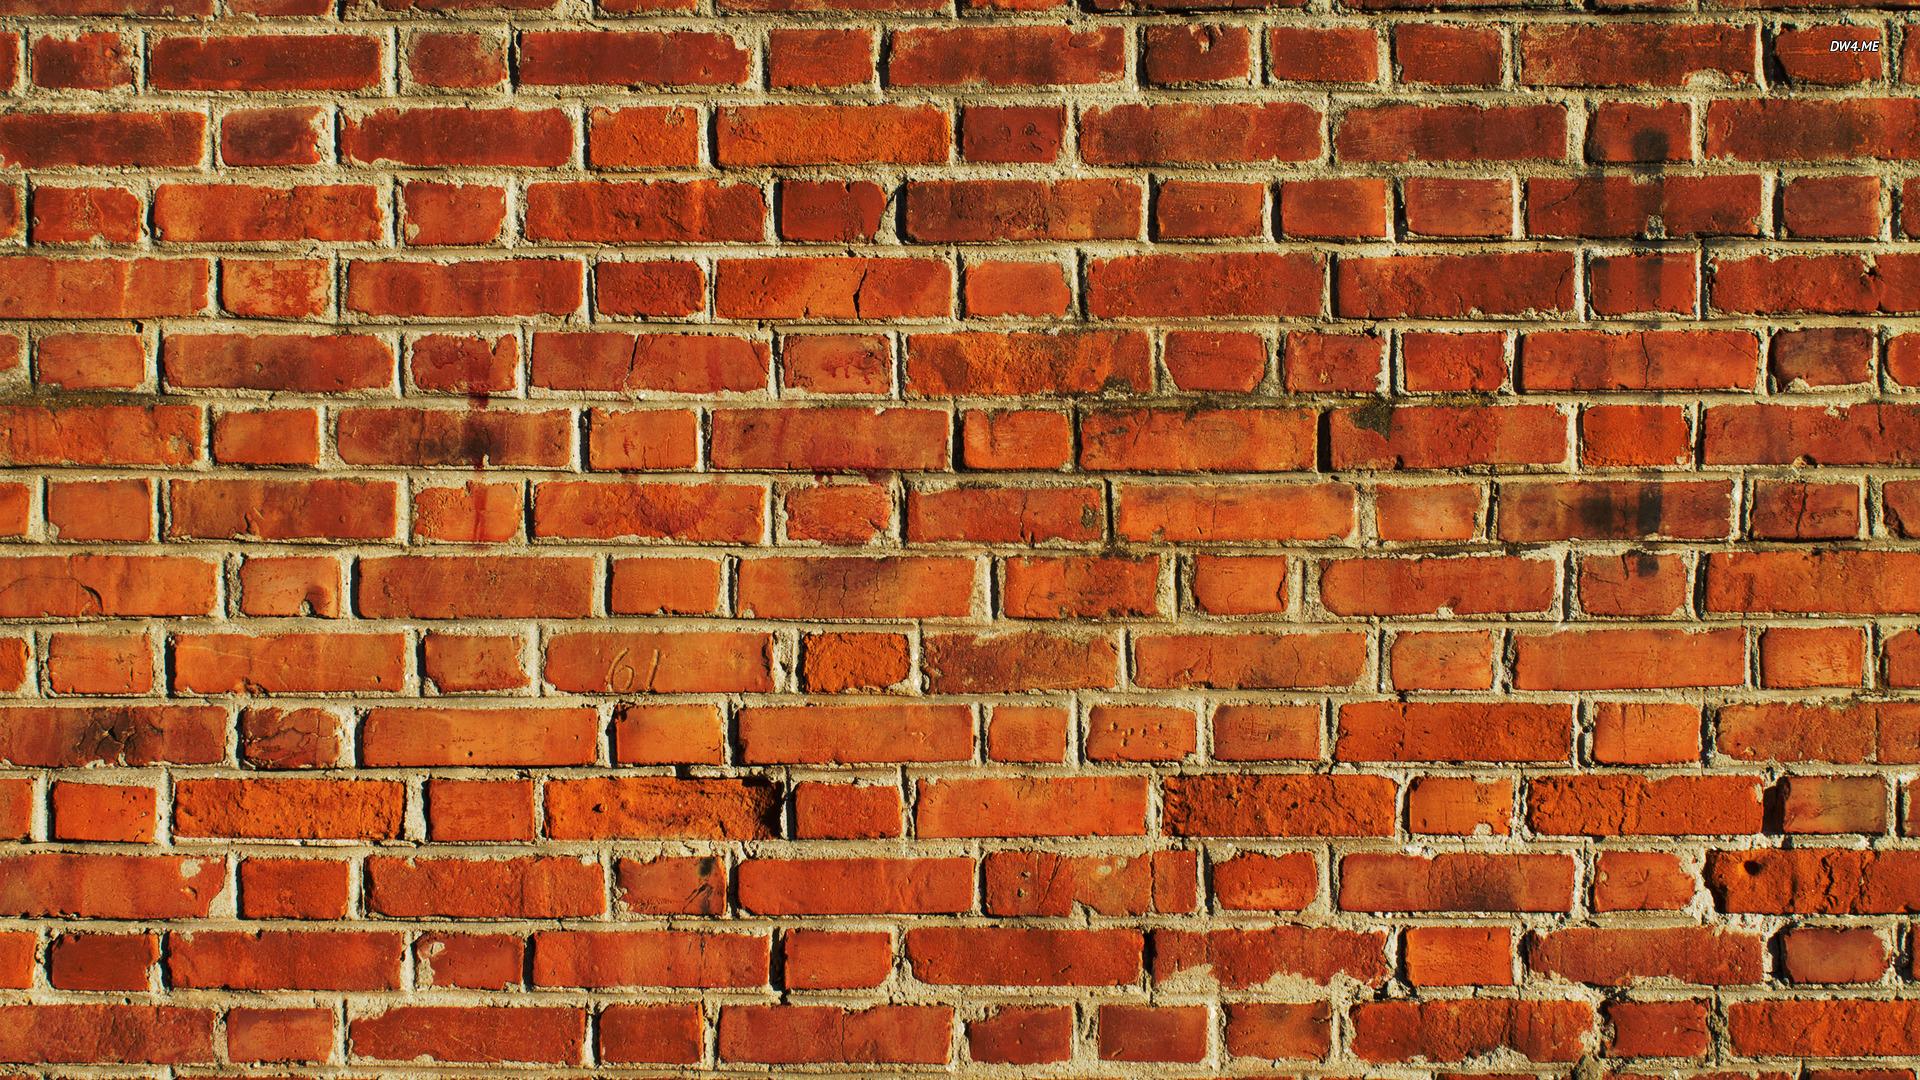 Brick wall wallpaper   Photography wallpapers   817 1920x1080